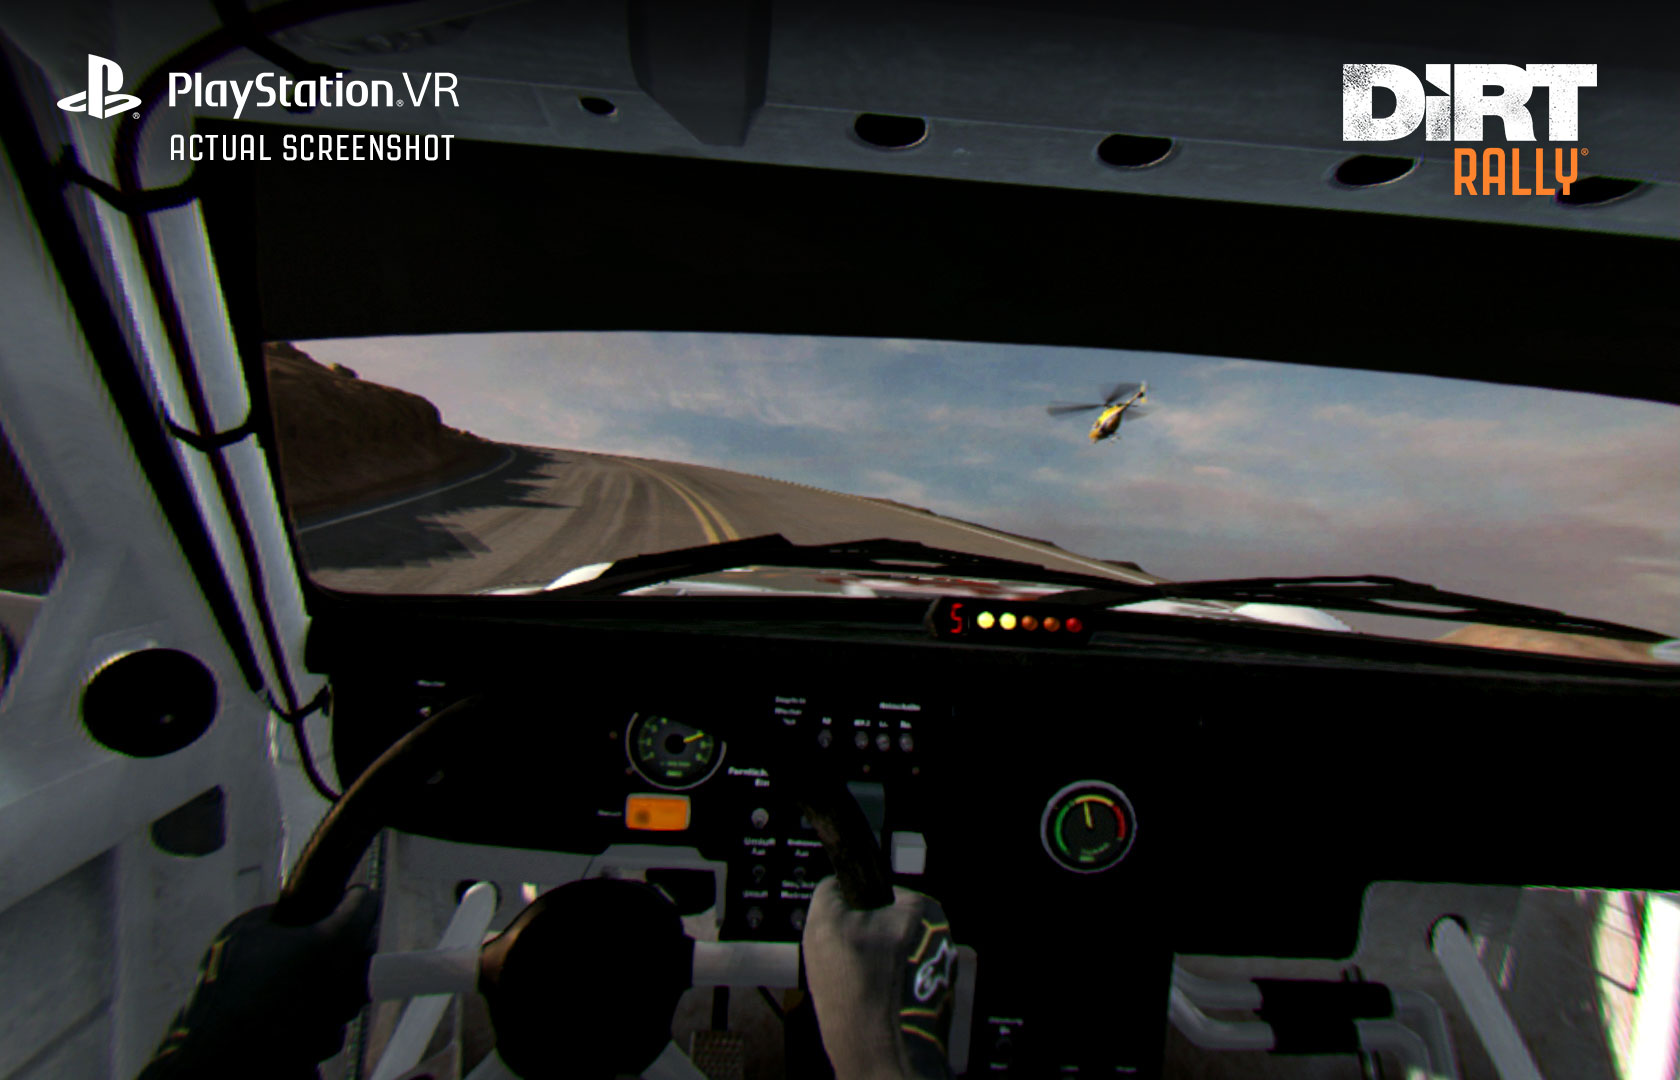 PSVR DiRT Rally Release.jpg